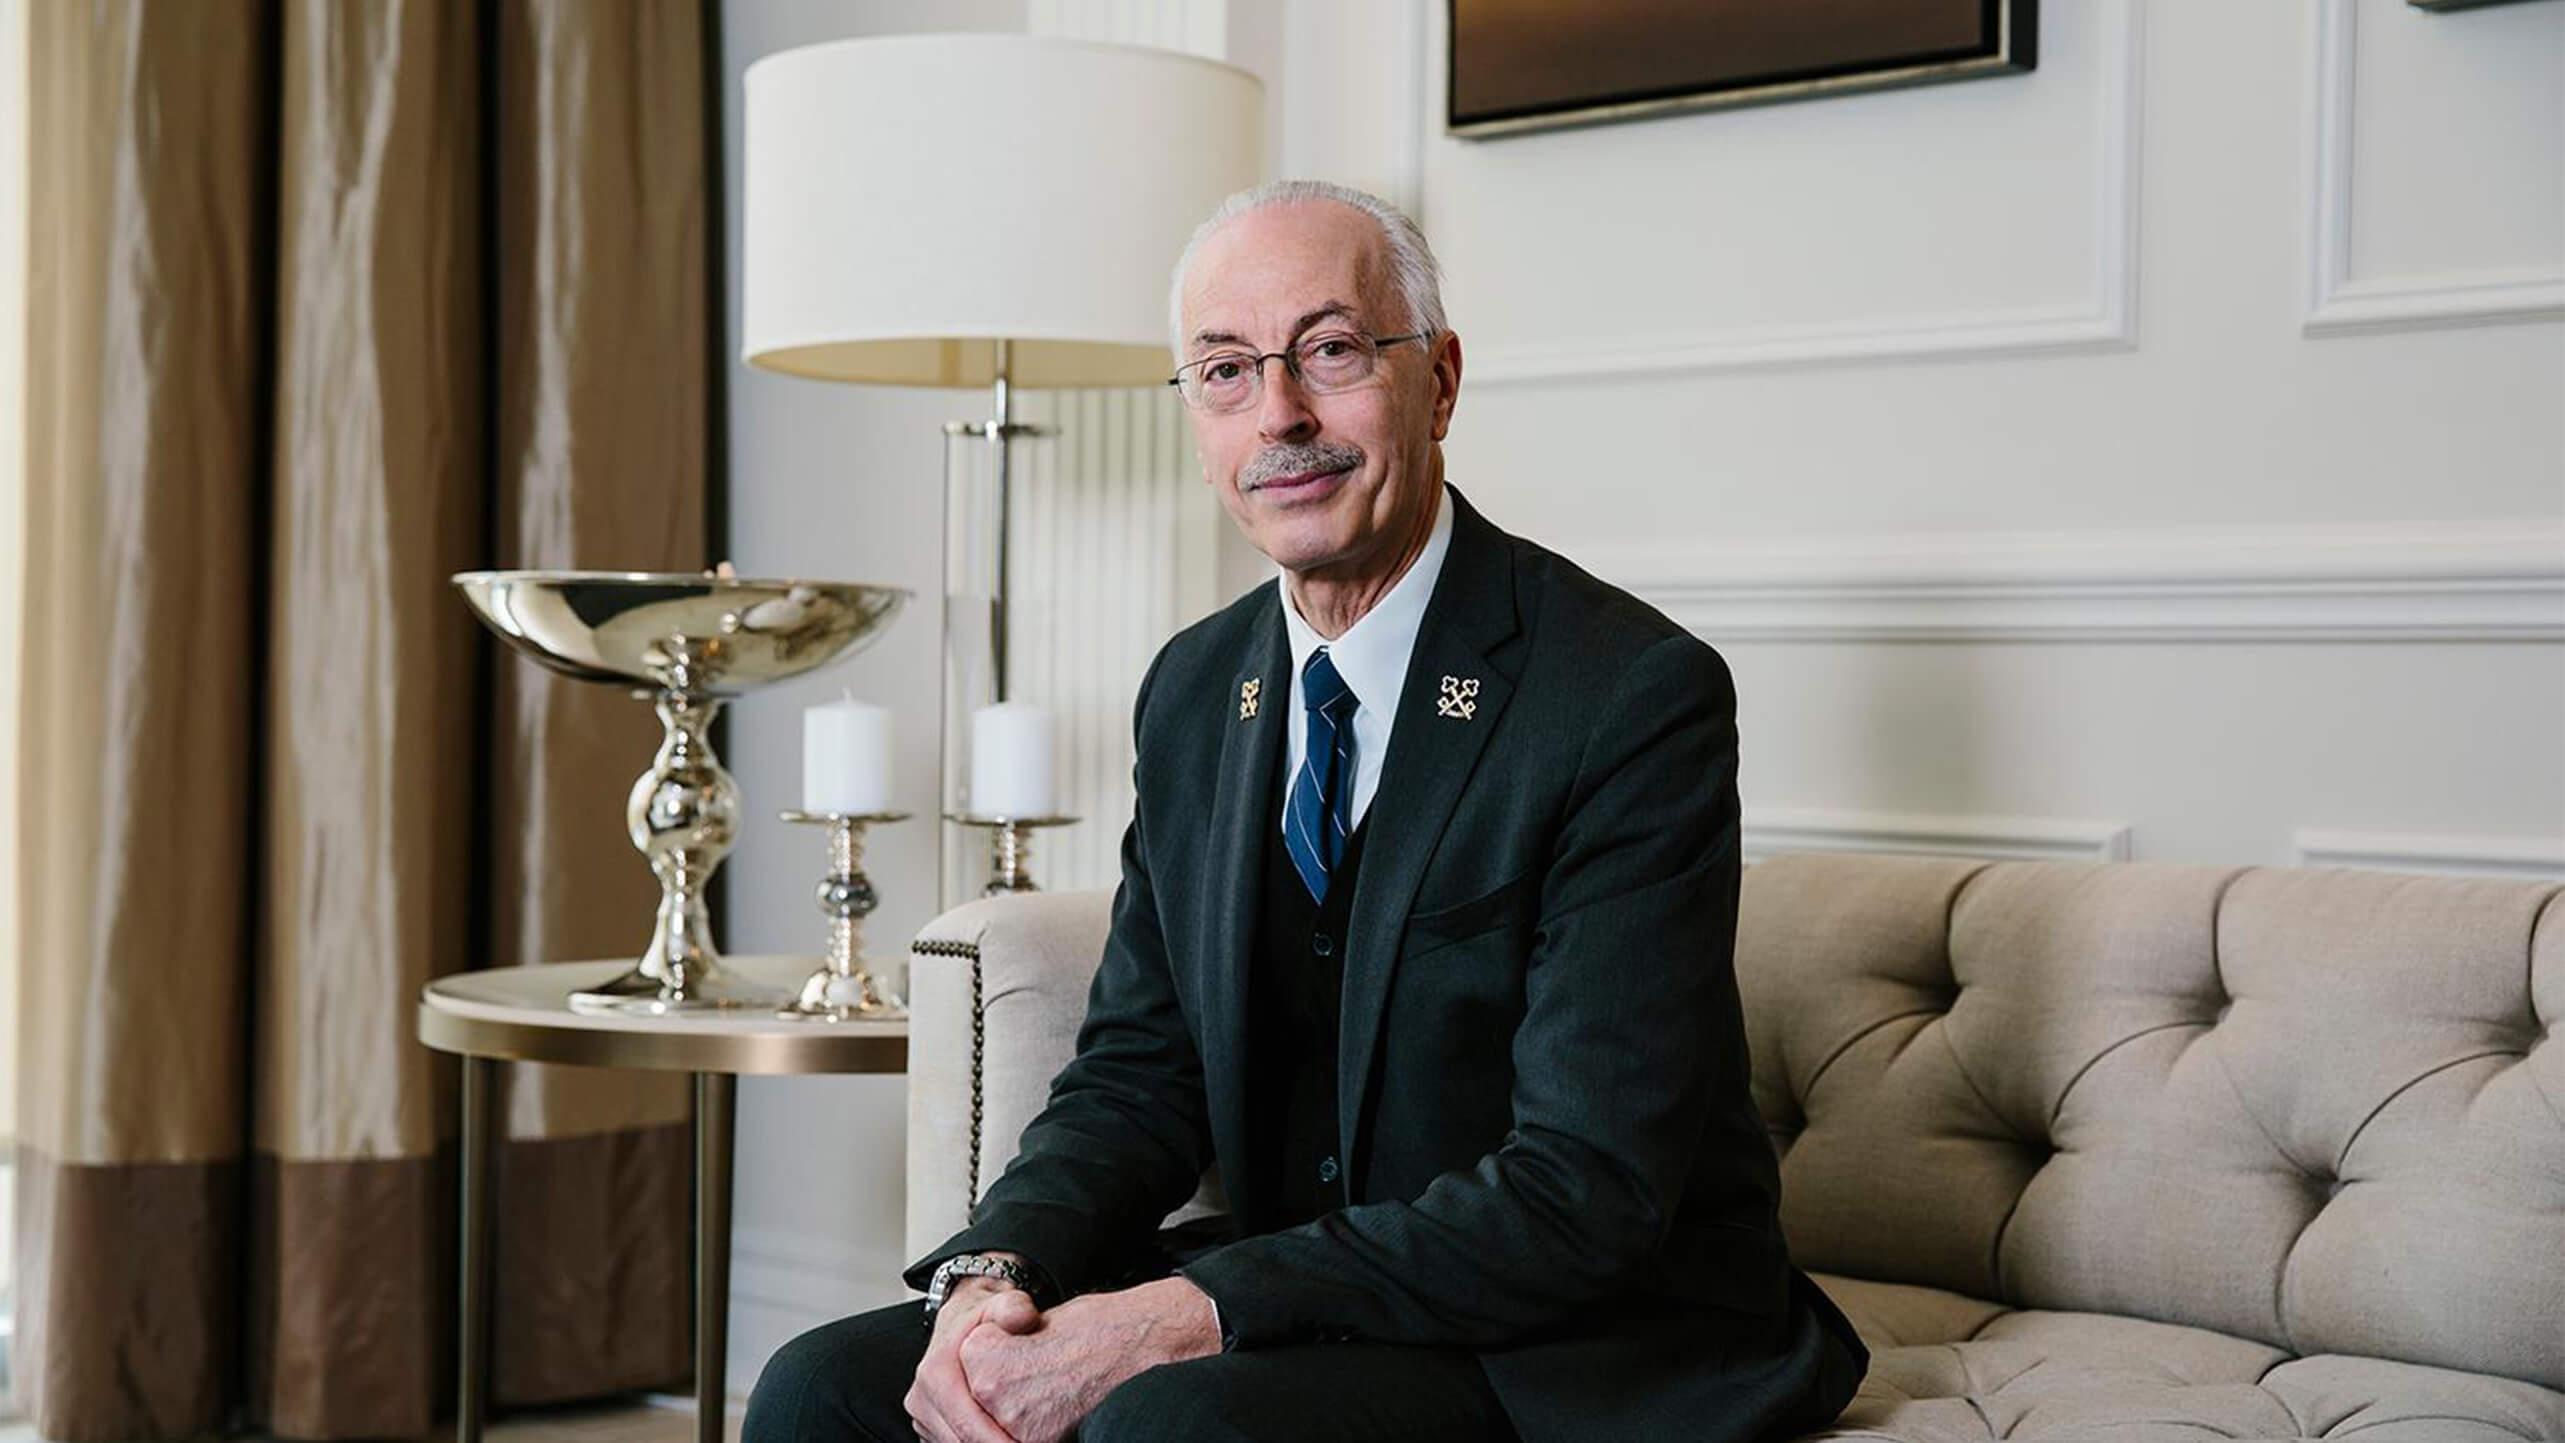 SoHo Hotel's Cchef concierge Lanfranco Gualandi